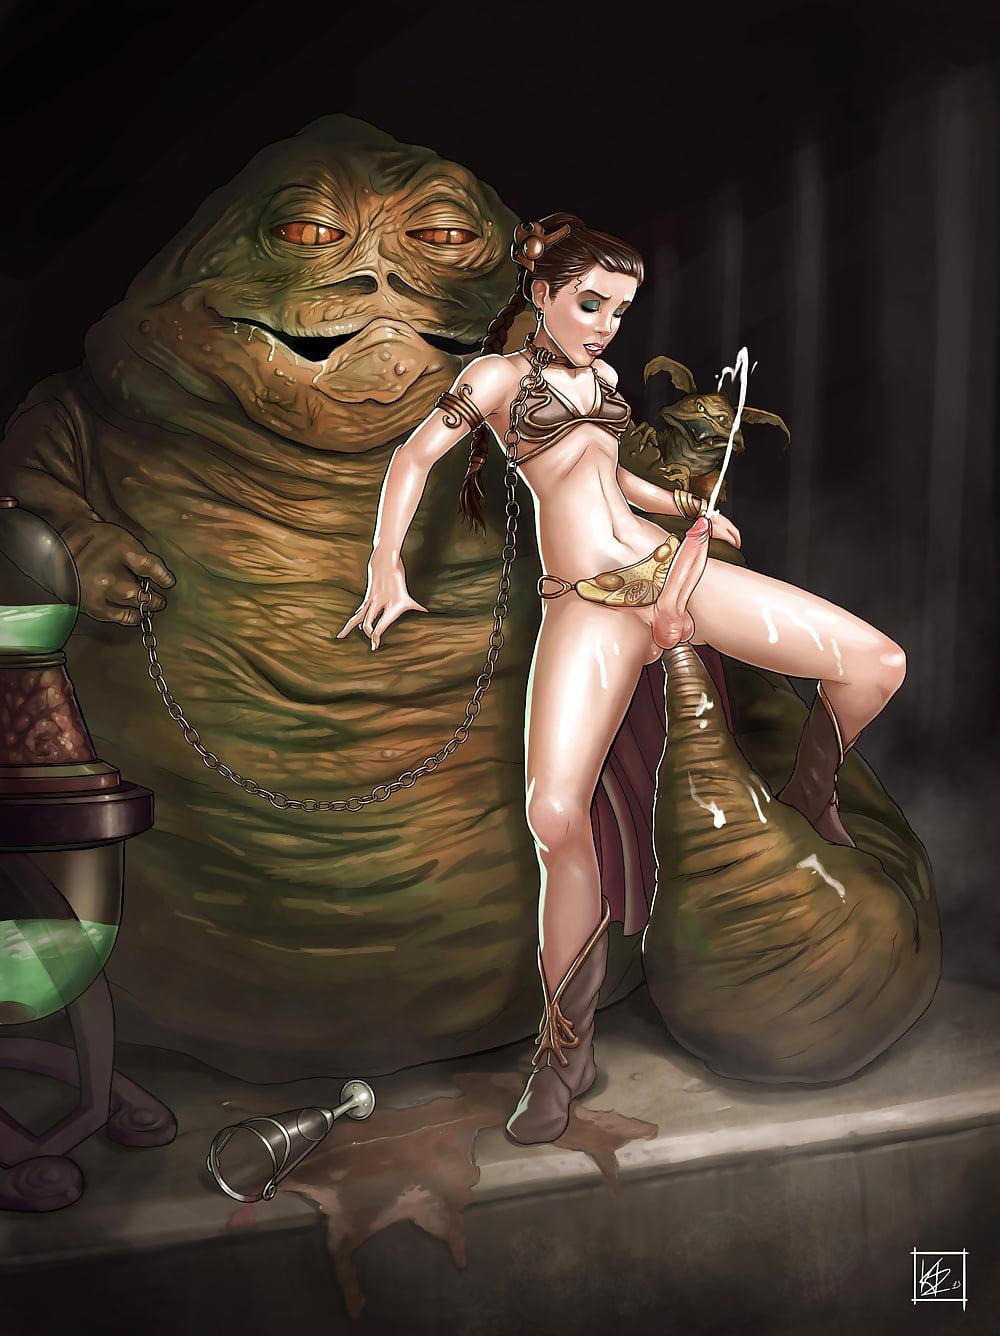 Free Slave Leia And Jabba The Hutt